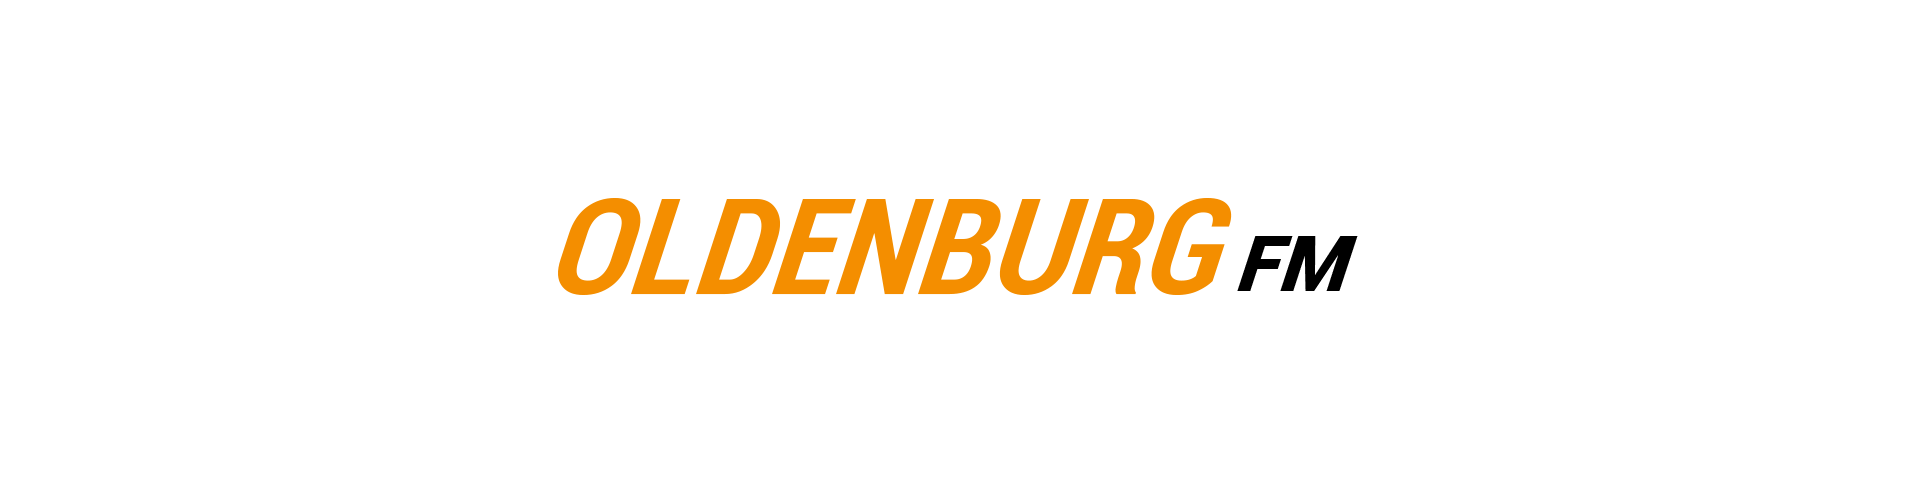 Oldenburg FM